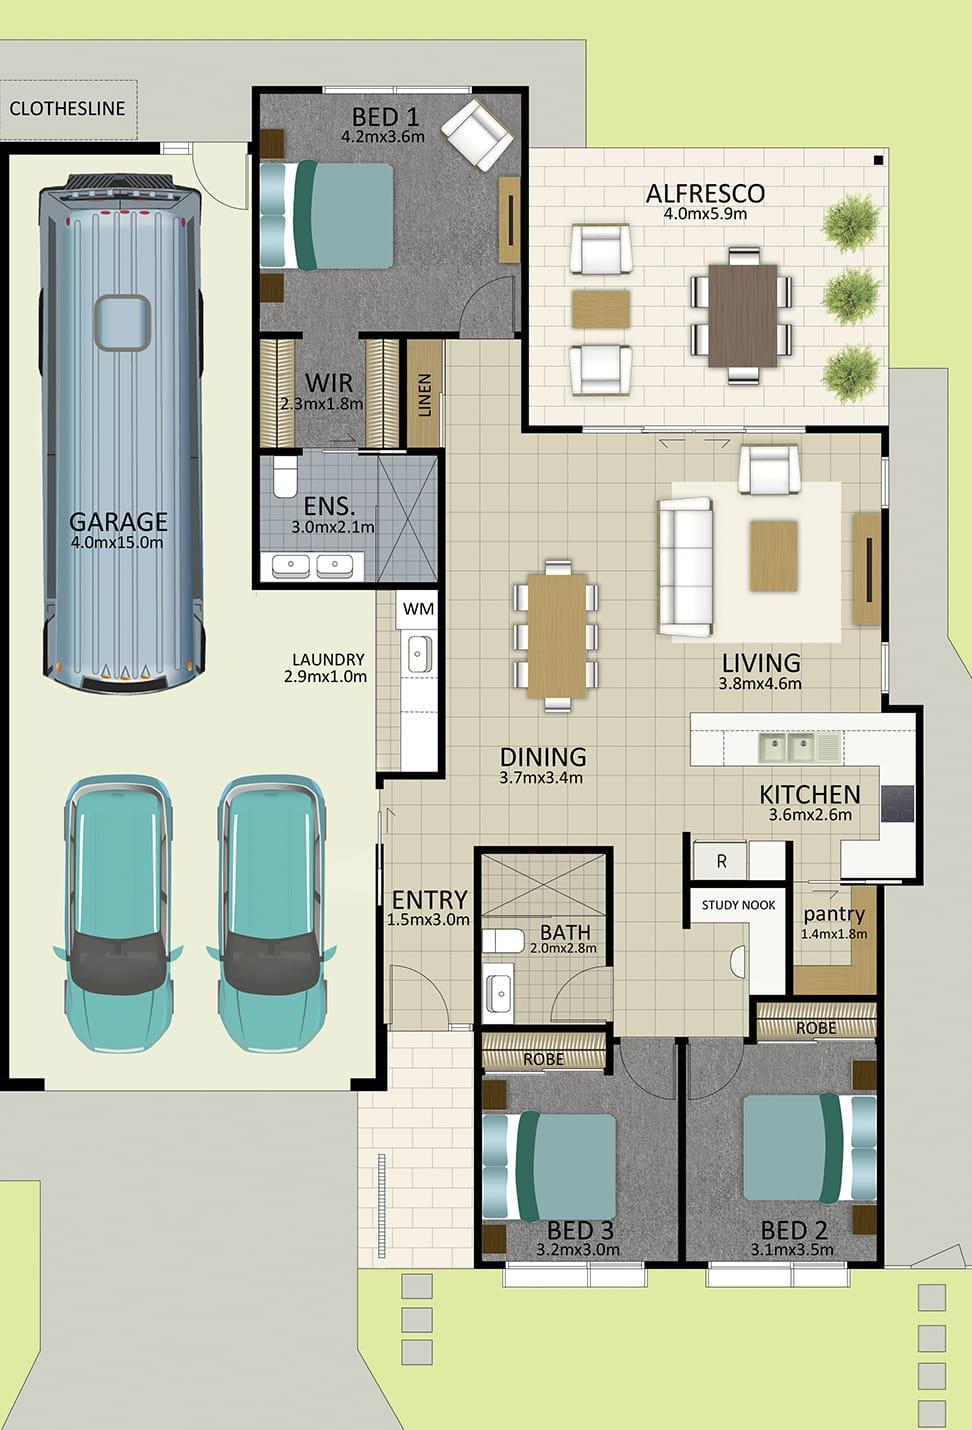 HR LAT25 Floorplan LOT 163 Watson MK3 OCT19 V1 - Lot 163